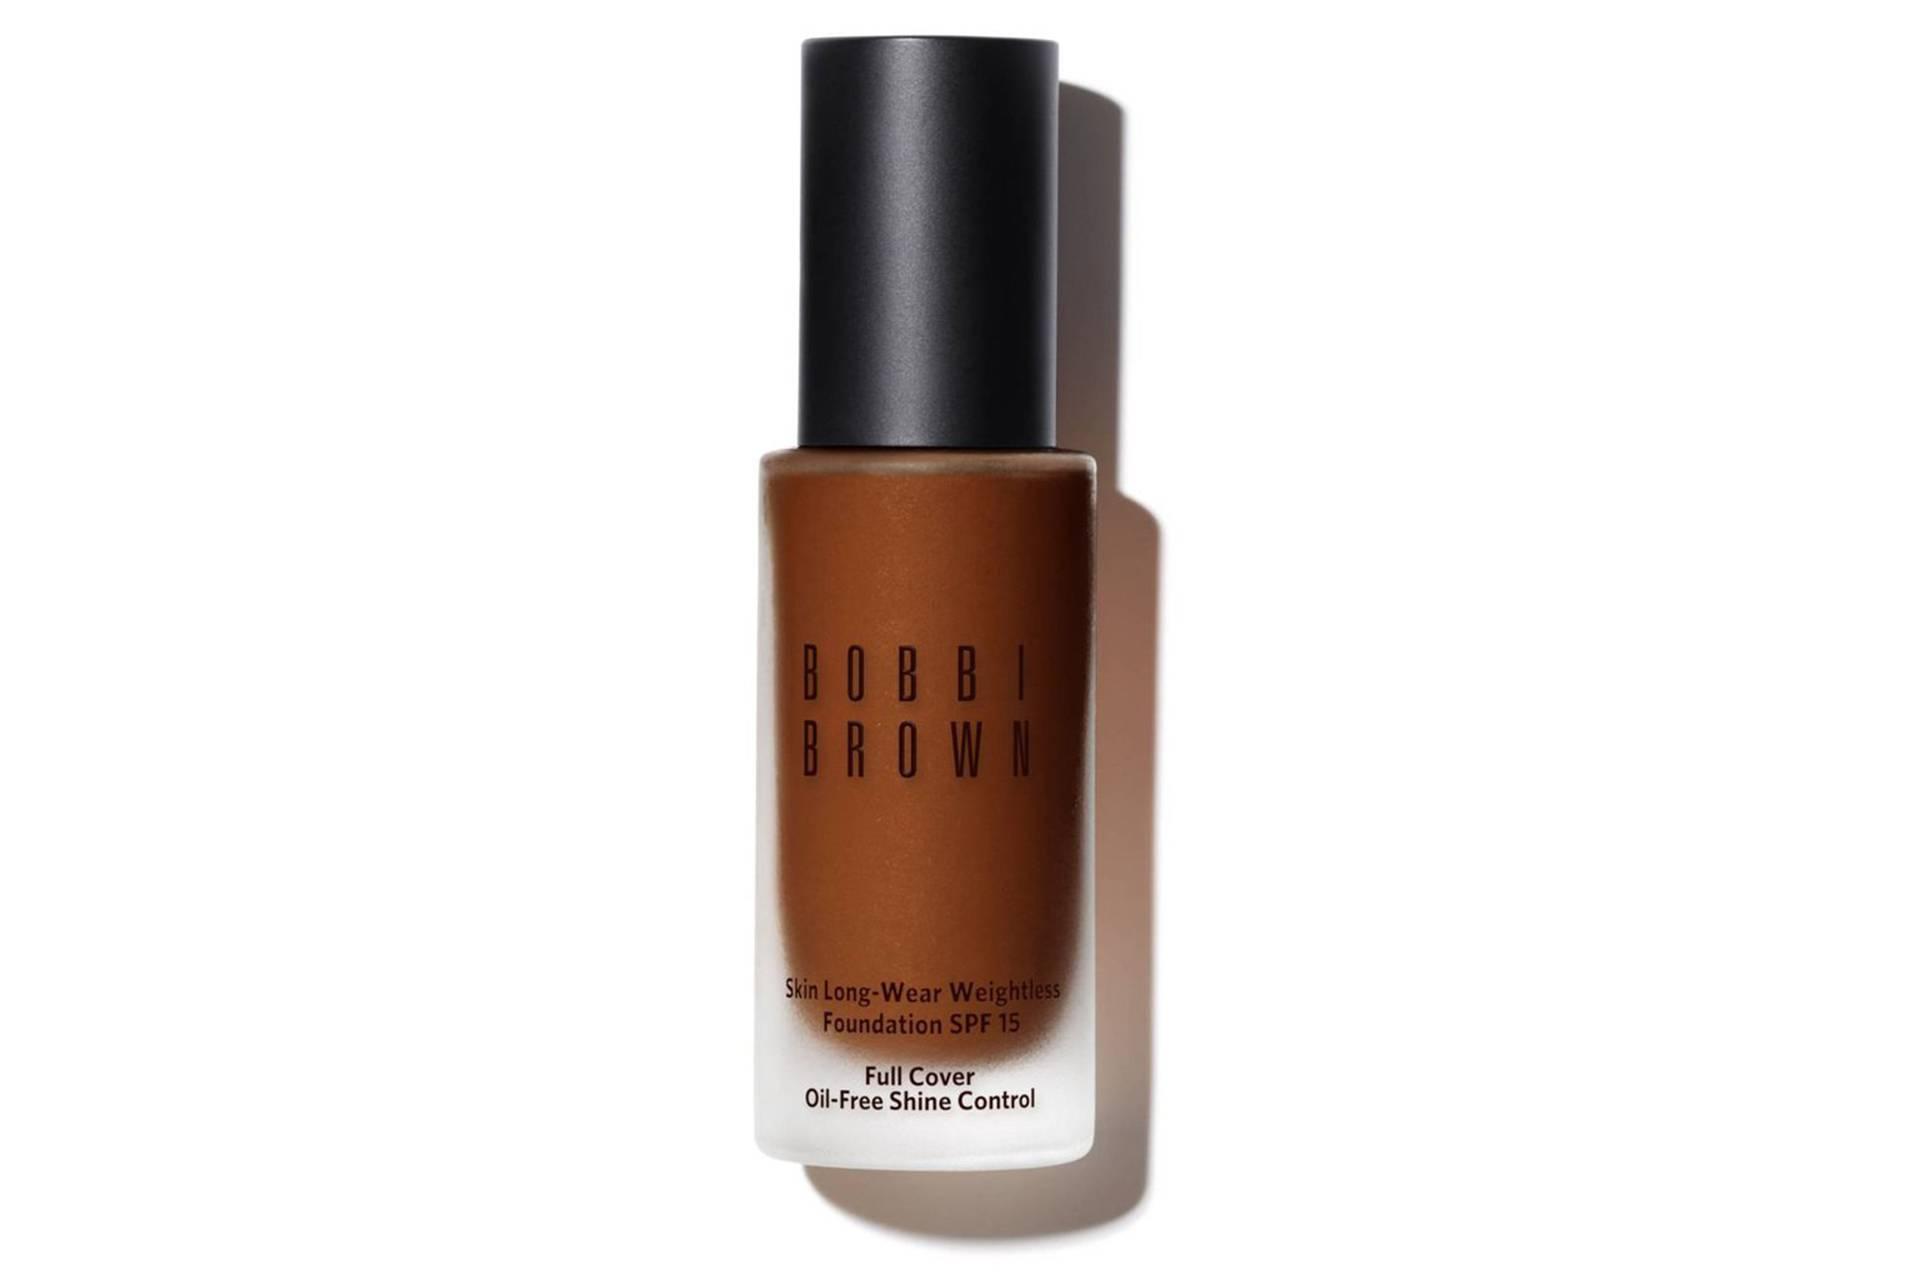 Best Foundations For Dark Skin Fenty Nars Marc Jacobs Glamour Uk